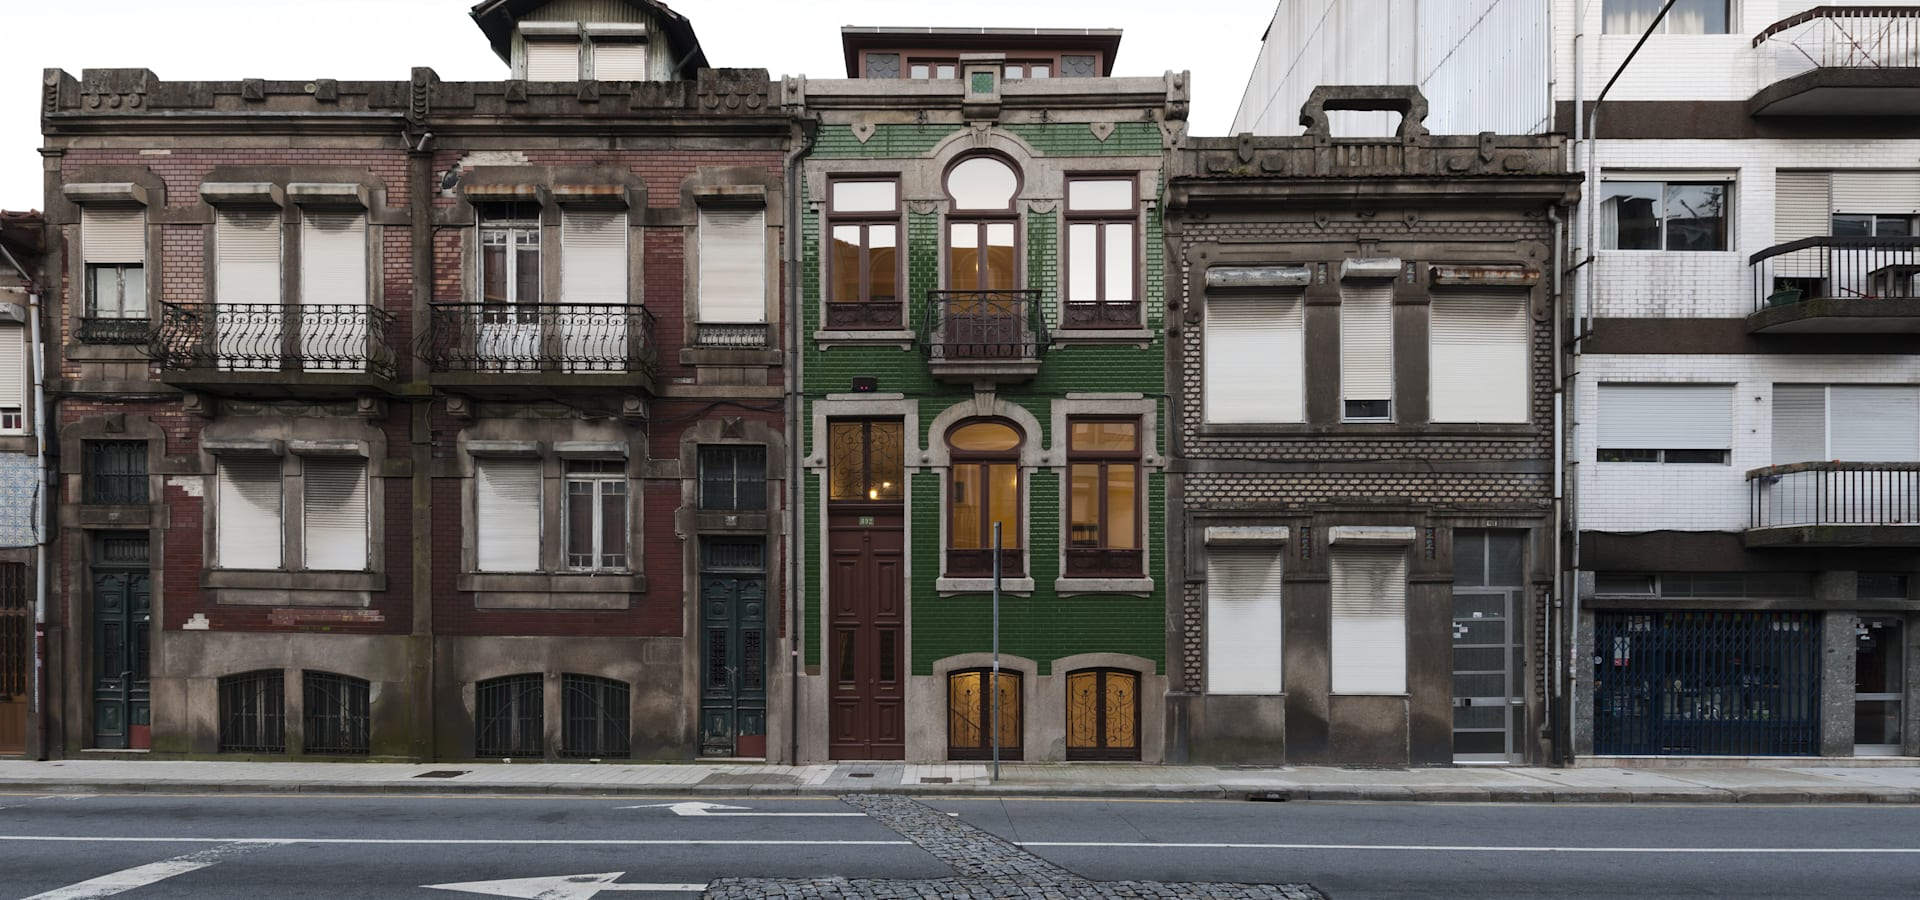 Inês Pimentel Arquitectura